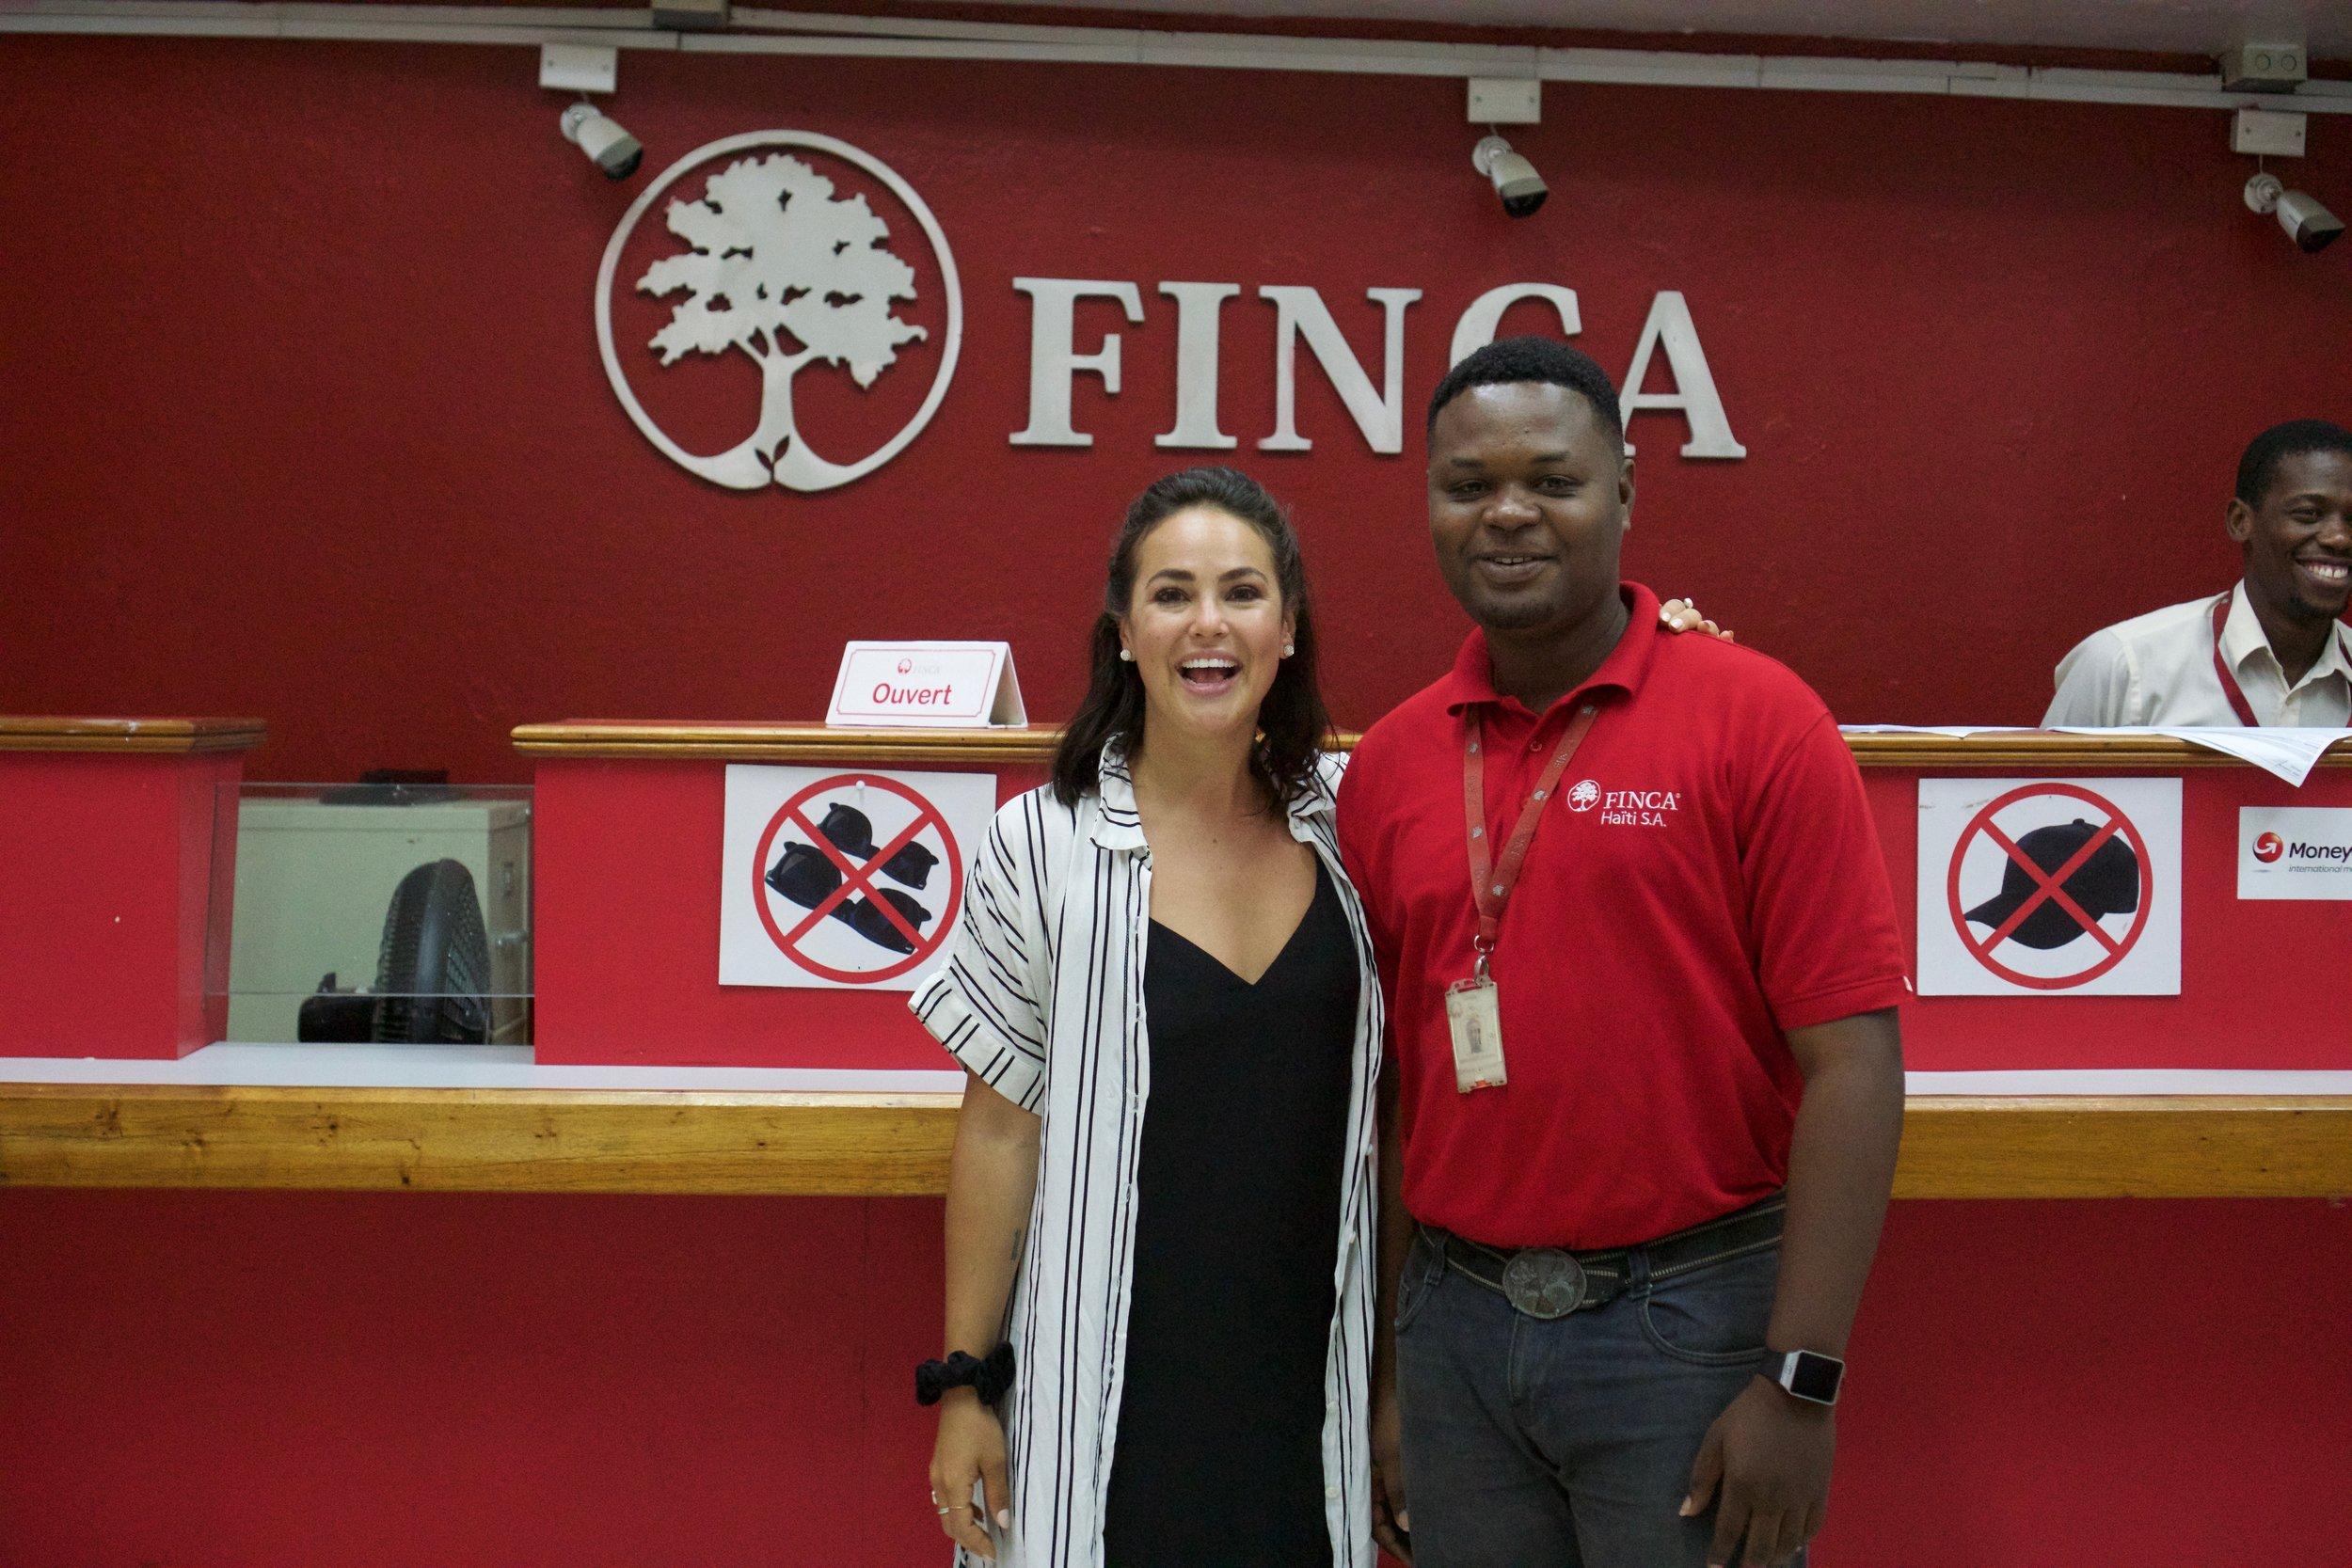 Chloe with VB Loan officer_FINCA Branch.jpg